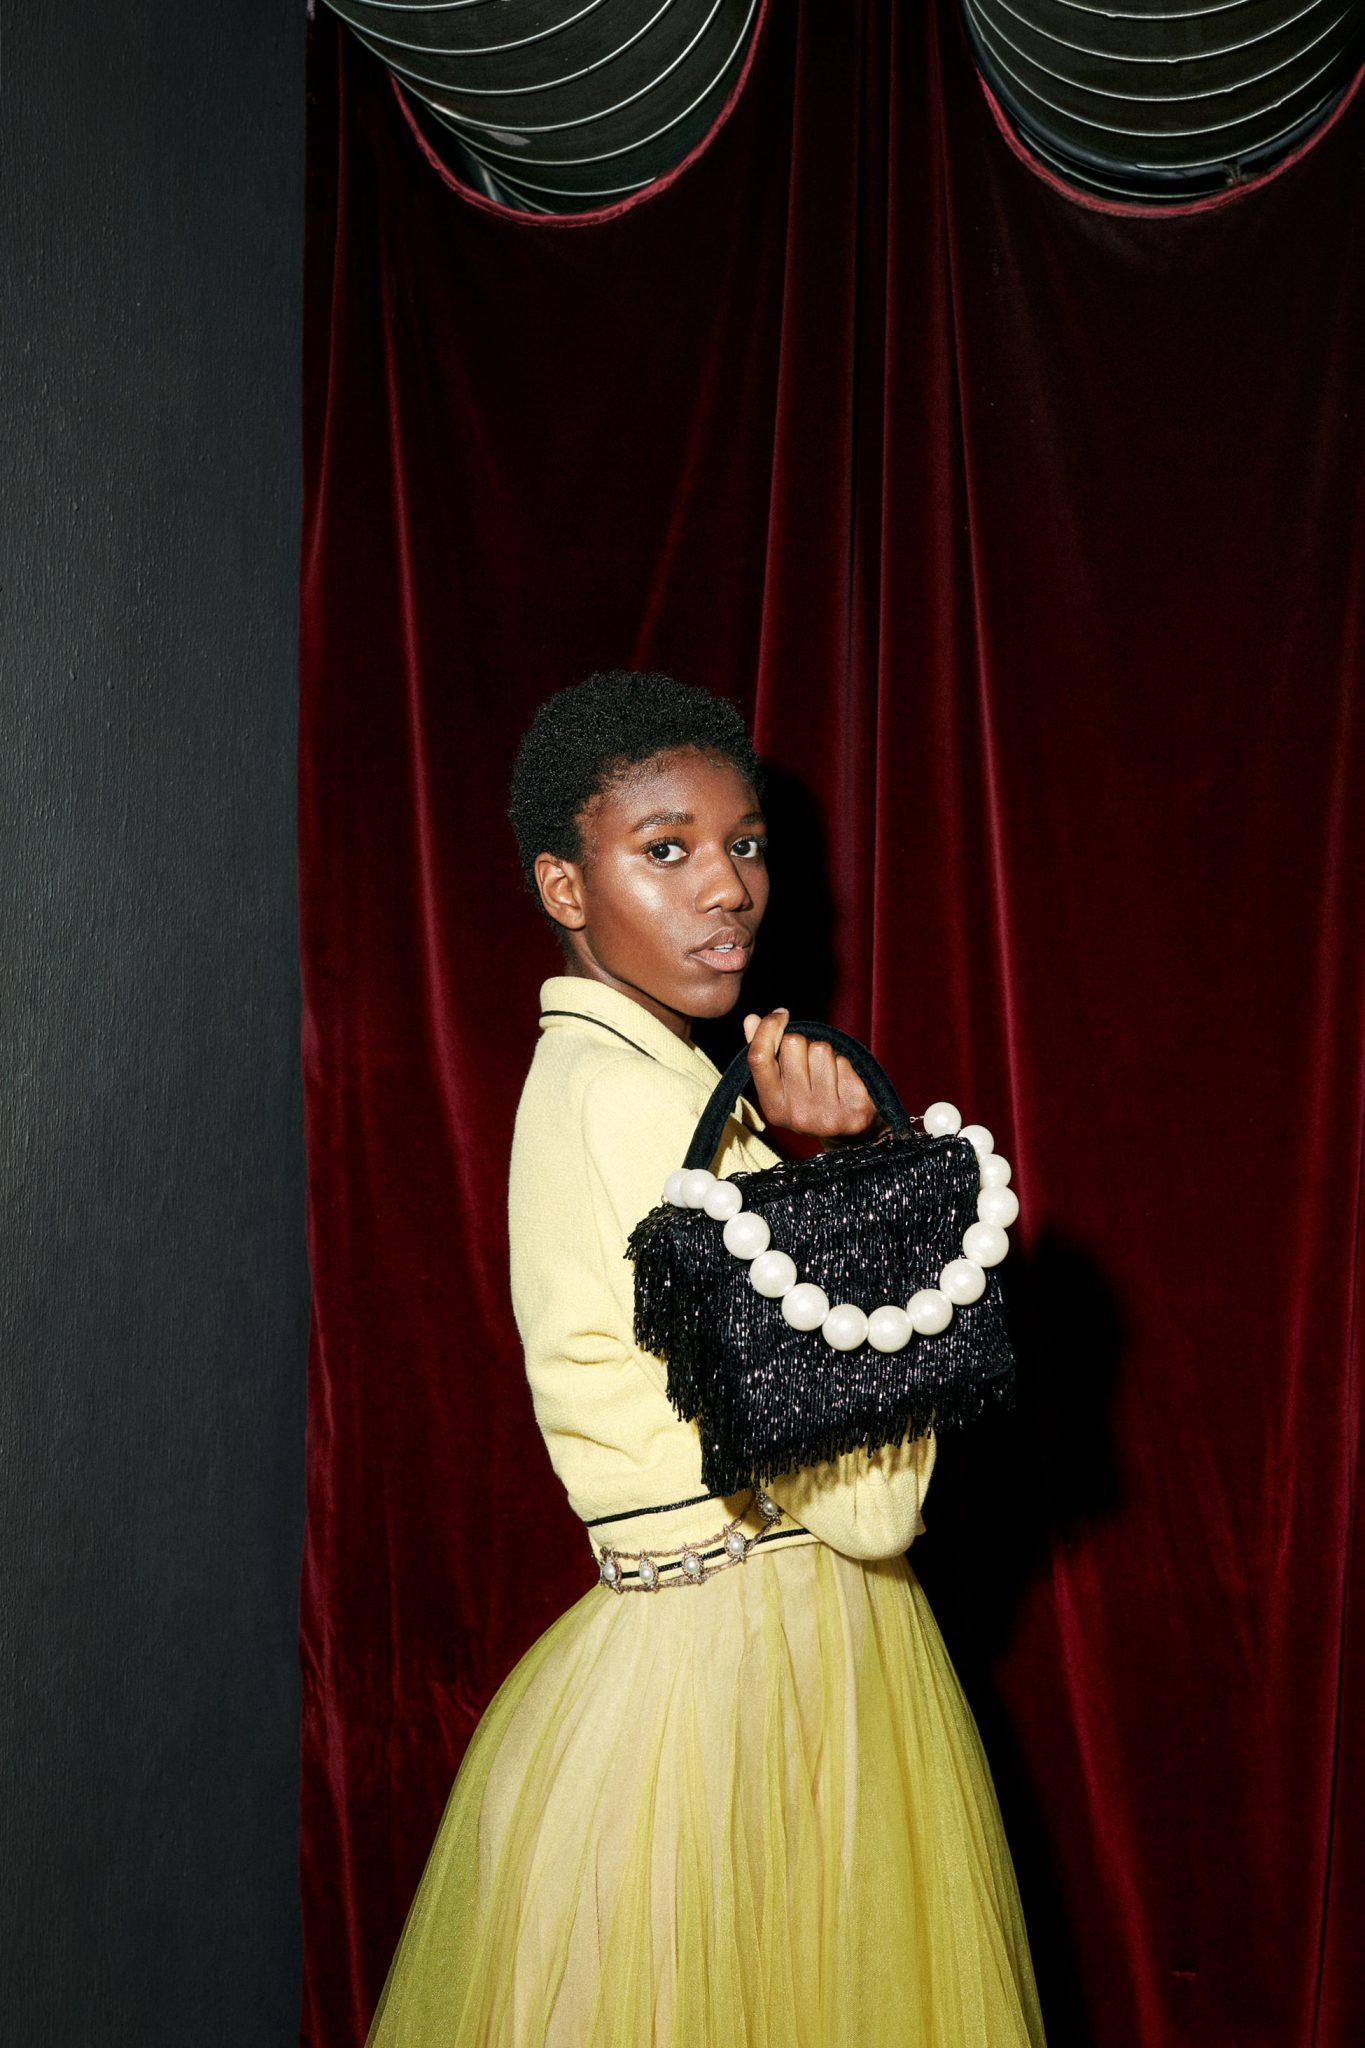 bibi Bachtadze, Chanel, silvester outfit, 2020